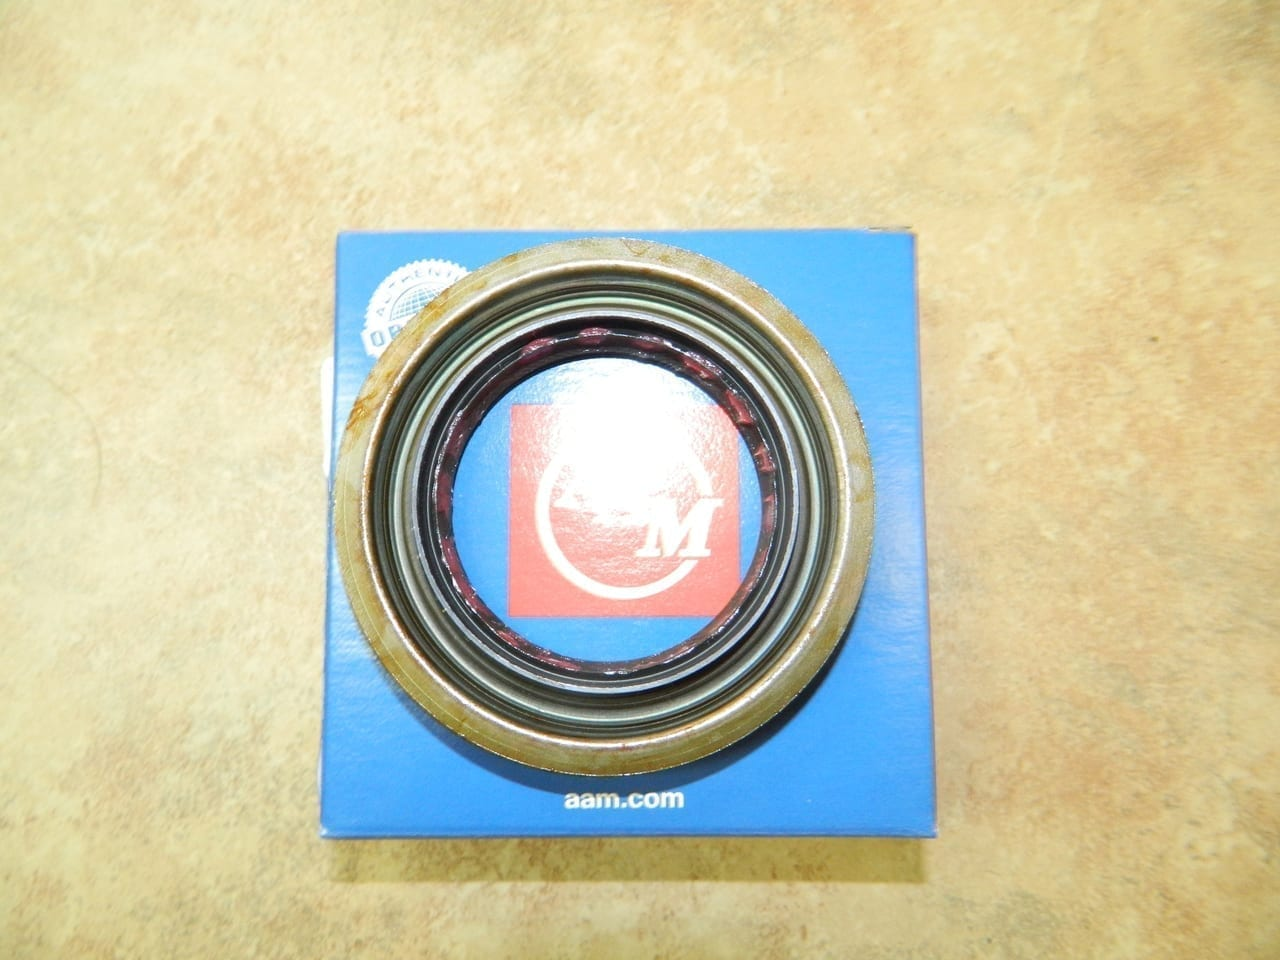 2003+ Dodge Ram 2500/3500 4X4 Front Axle Pinion Seal 9.25 C9.25